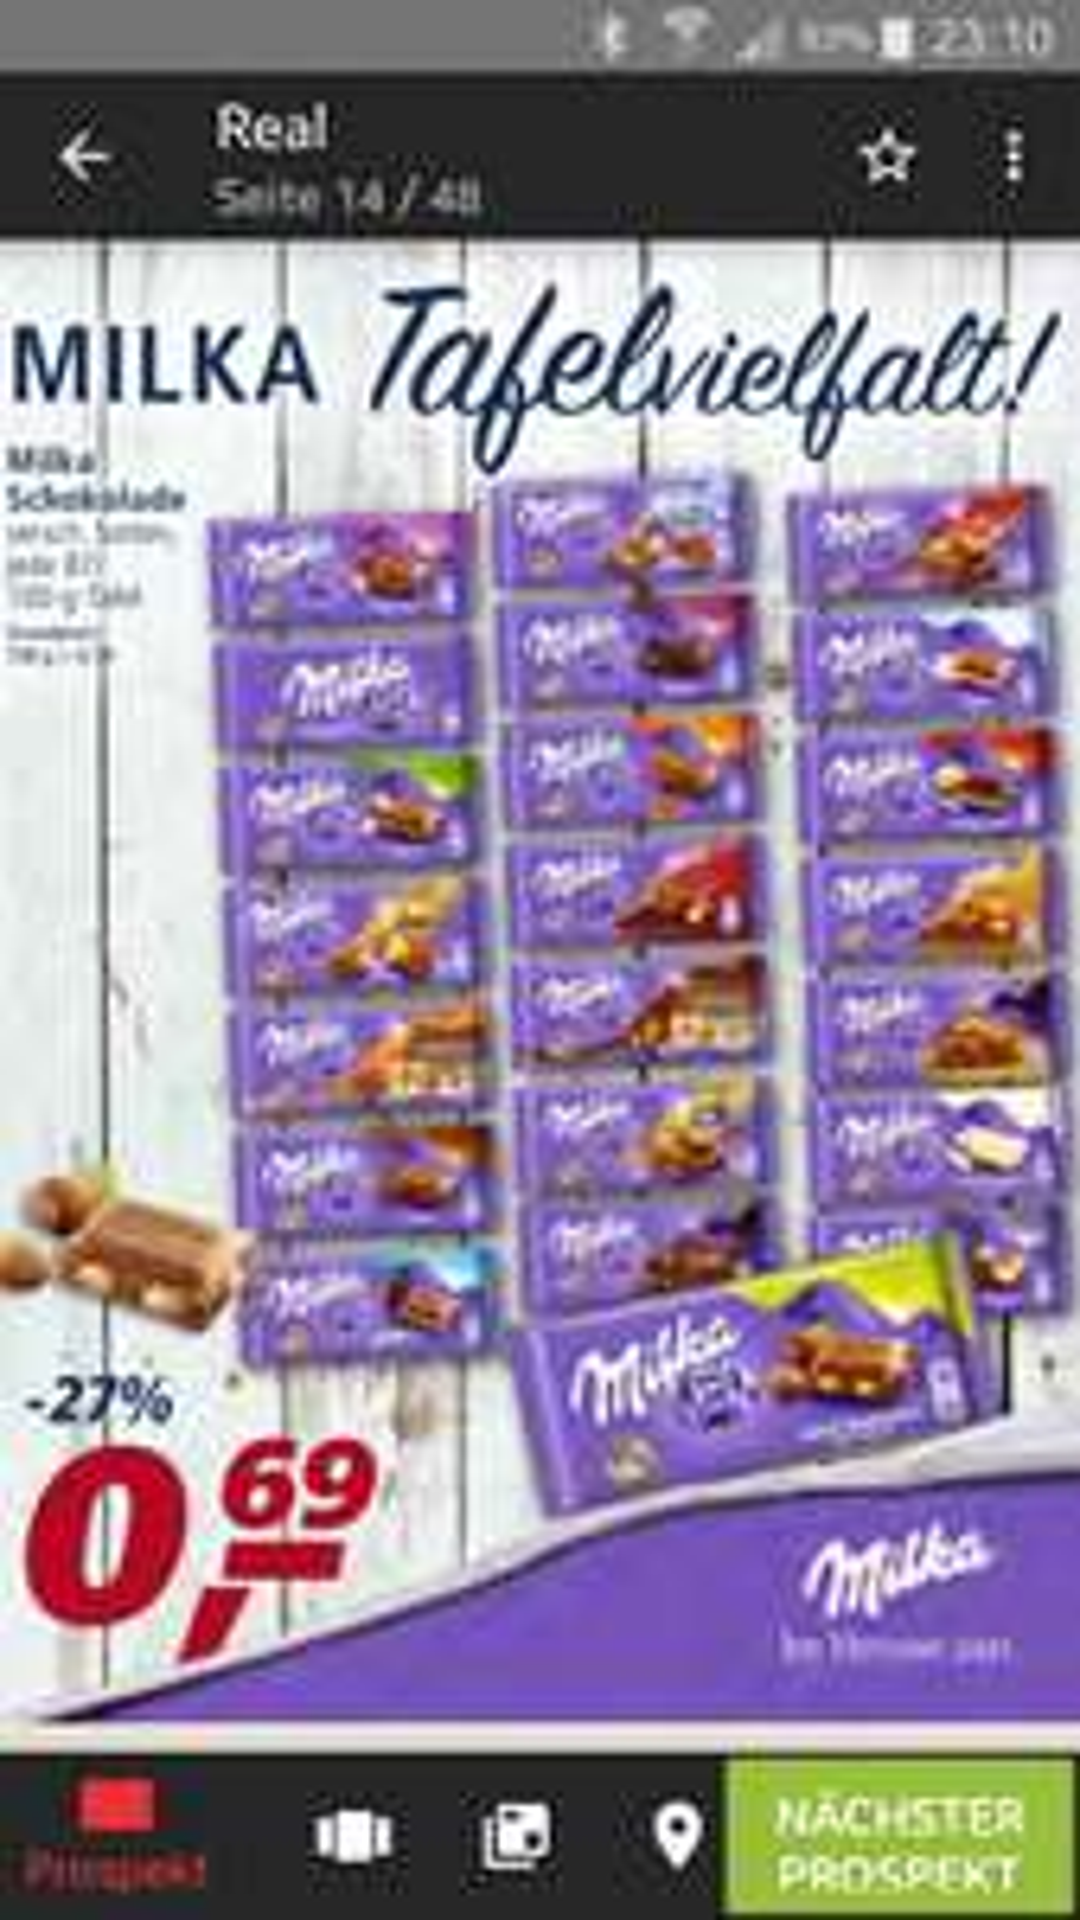 [Real] Milka Schokolade bundesweit